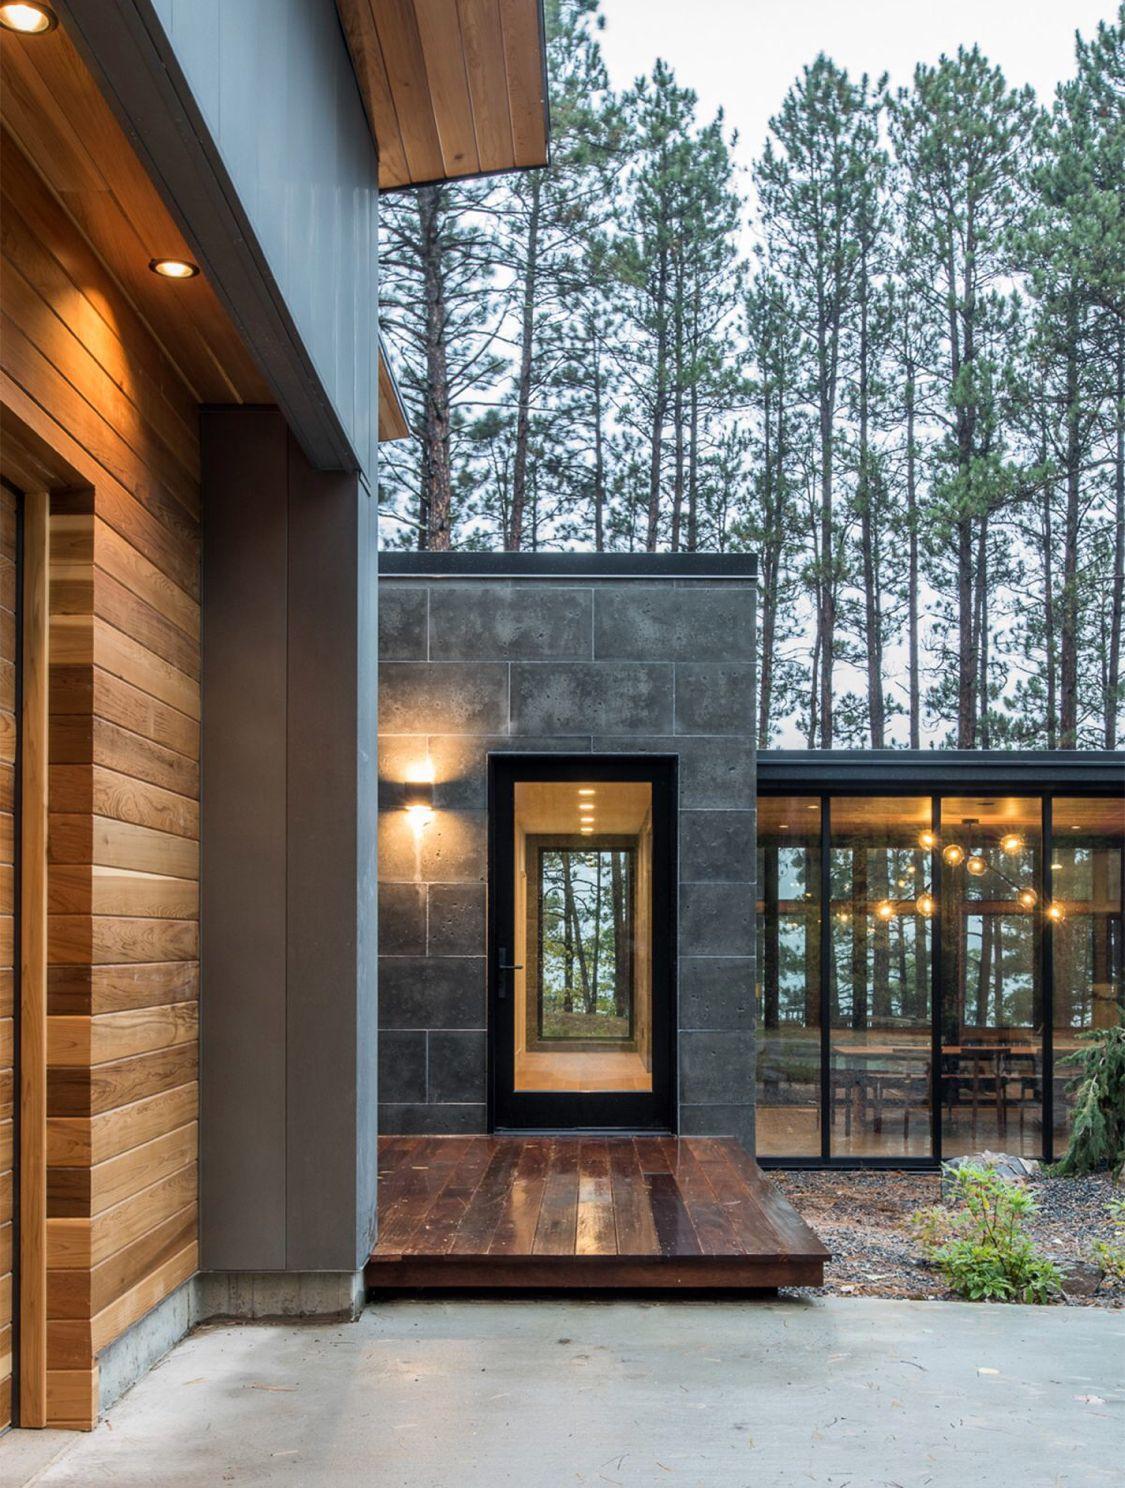 Idee Fassade Modernes Haus - linearsystem.co - Home Design Ideen und ...